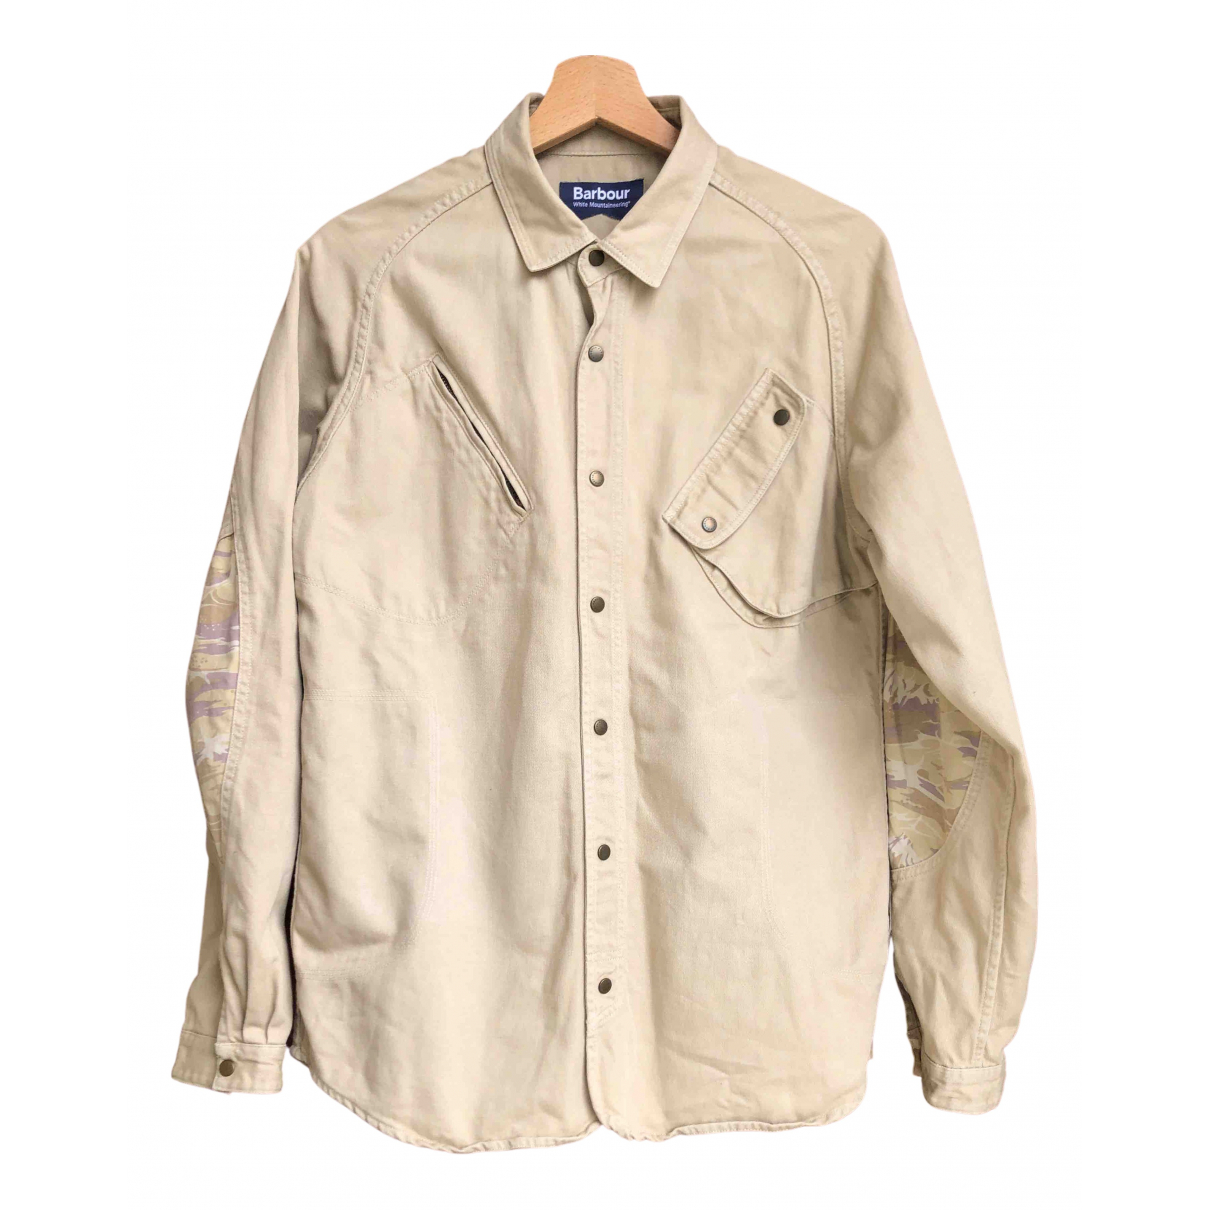 Barbour \N Beige Cotton Shirts for Men M International